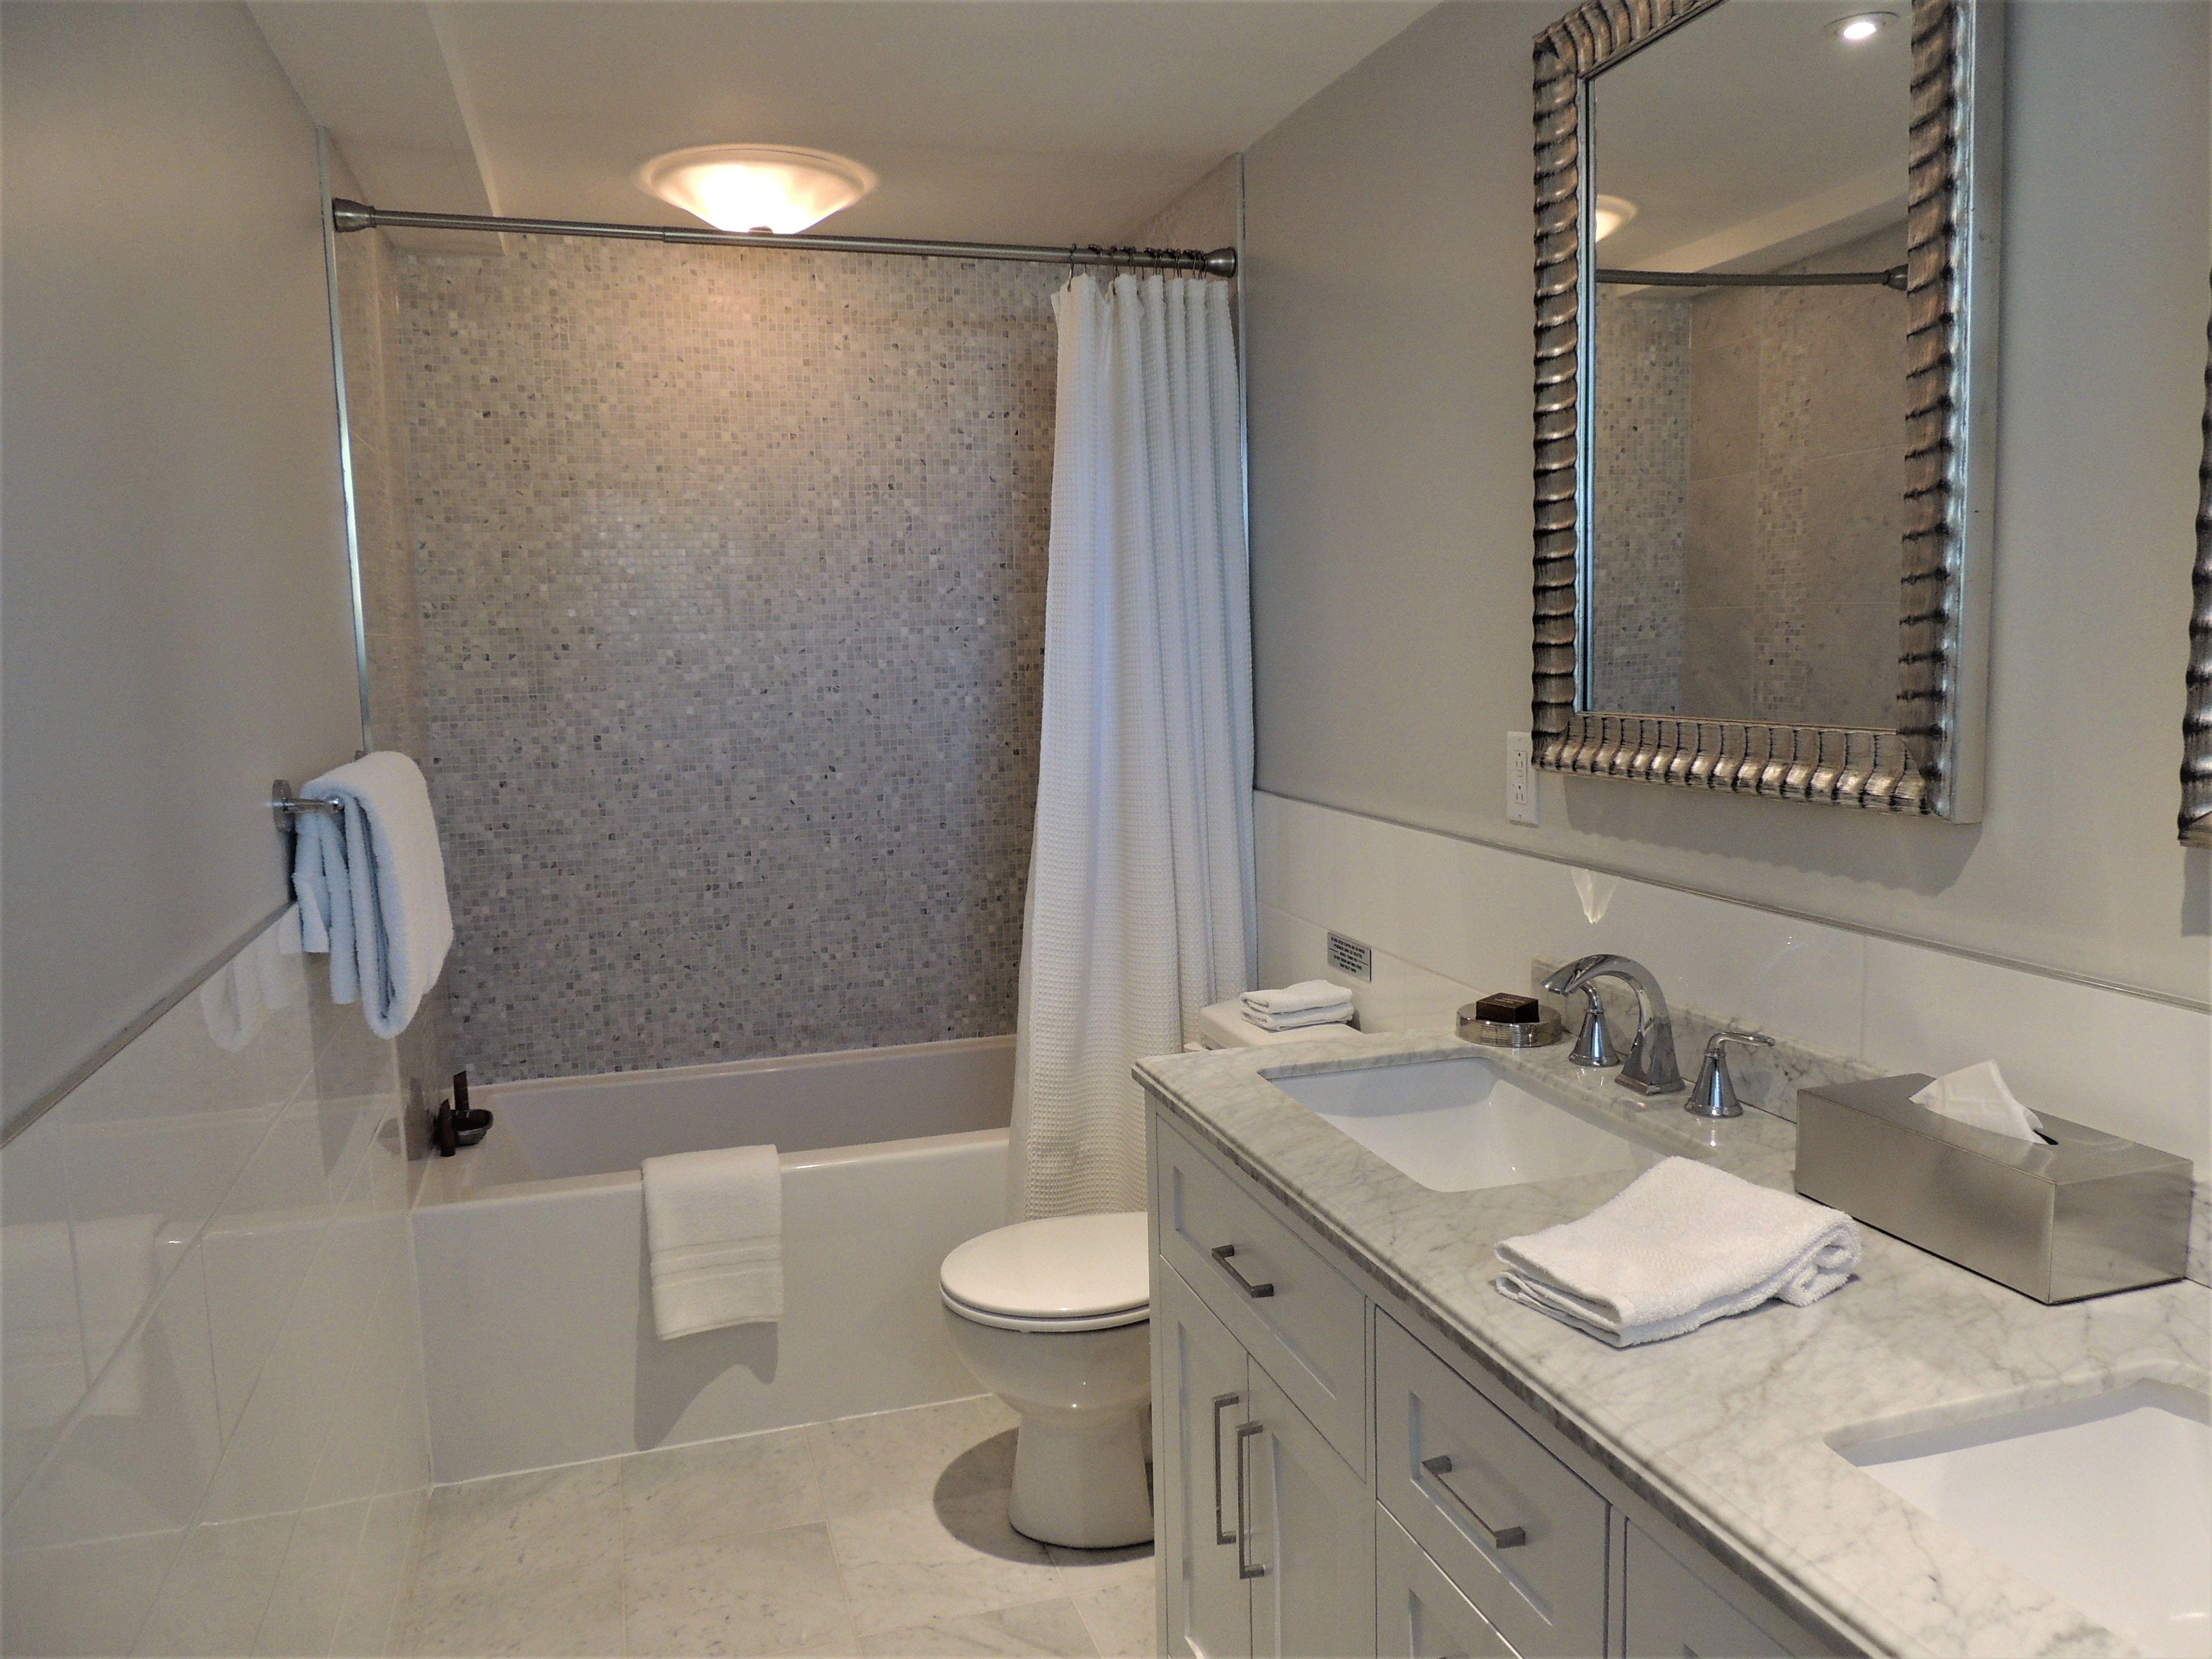 Suite Topaz Salle de bain